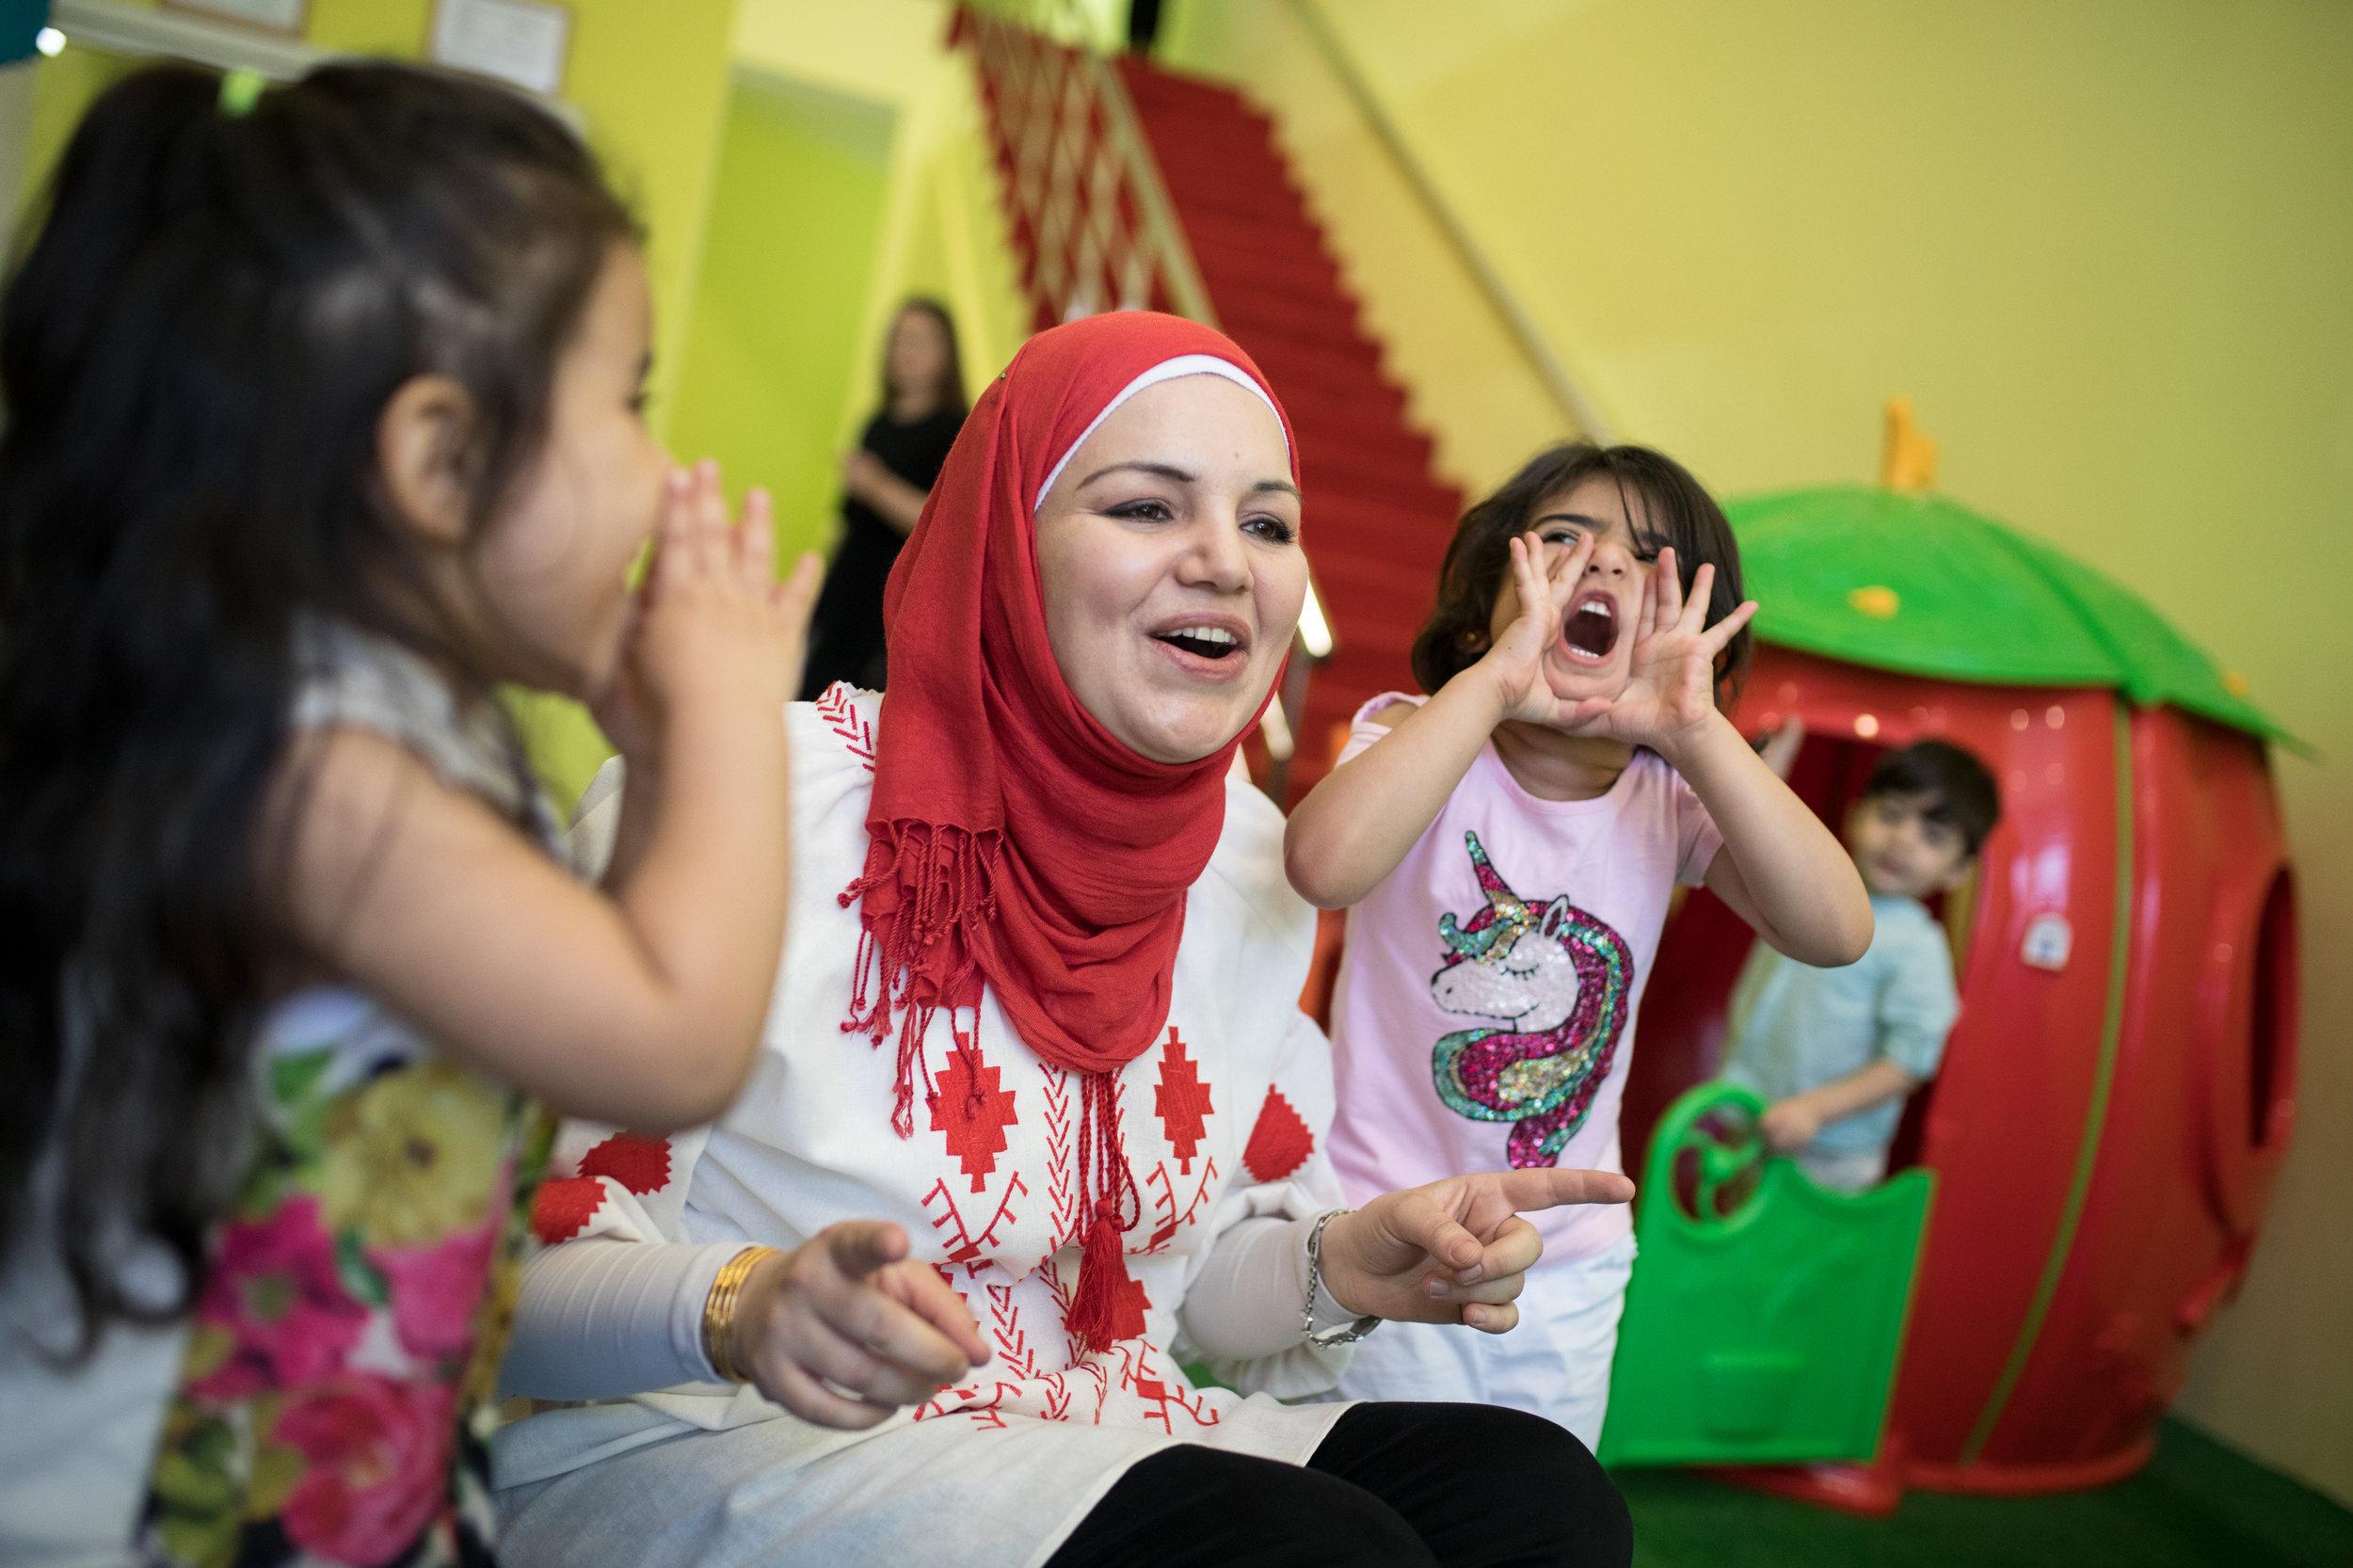 2018-07-03_Dania Al Bouchi, 30, Dunya Al Khayal Kindergarten, Gaziantep, TK_0189.jpg